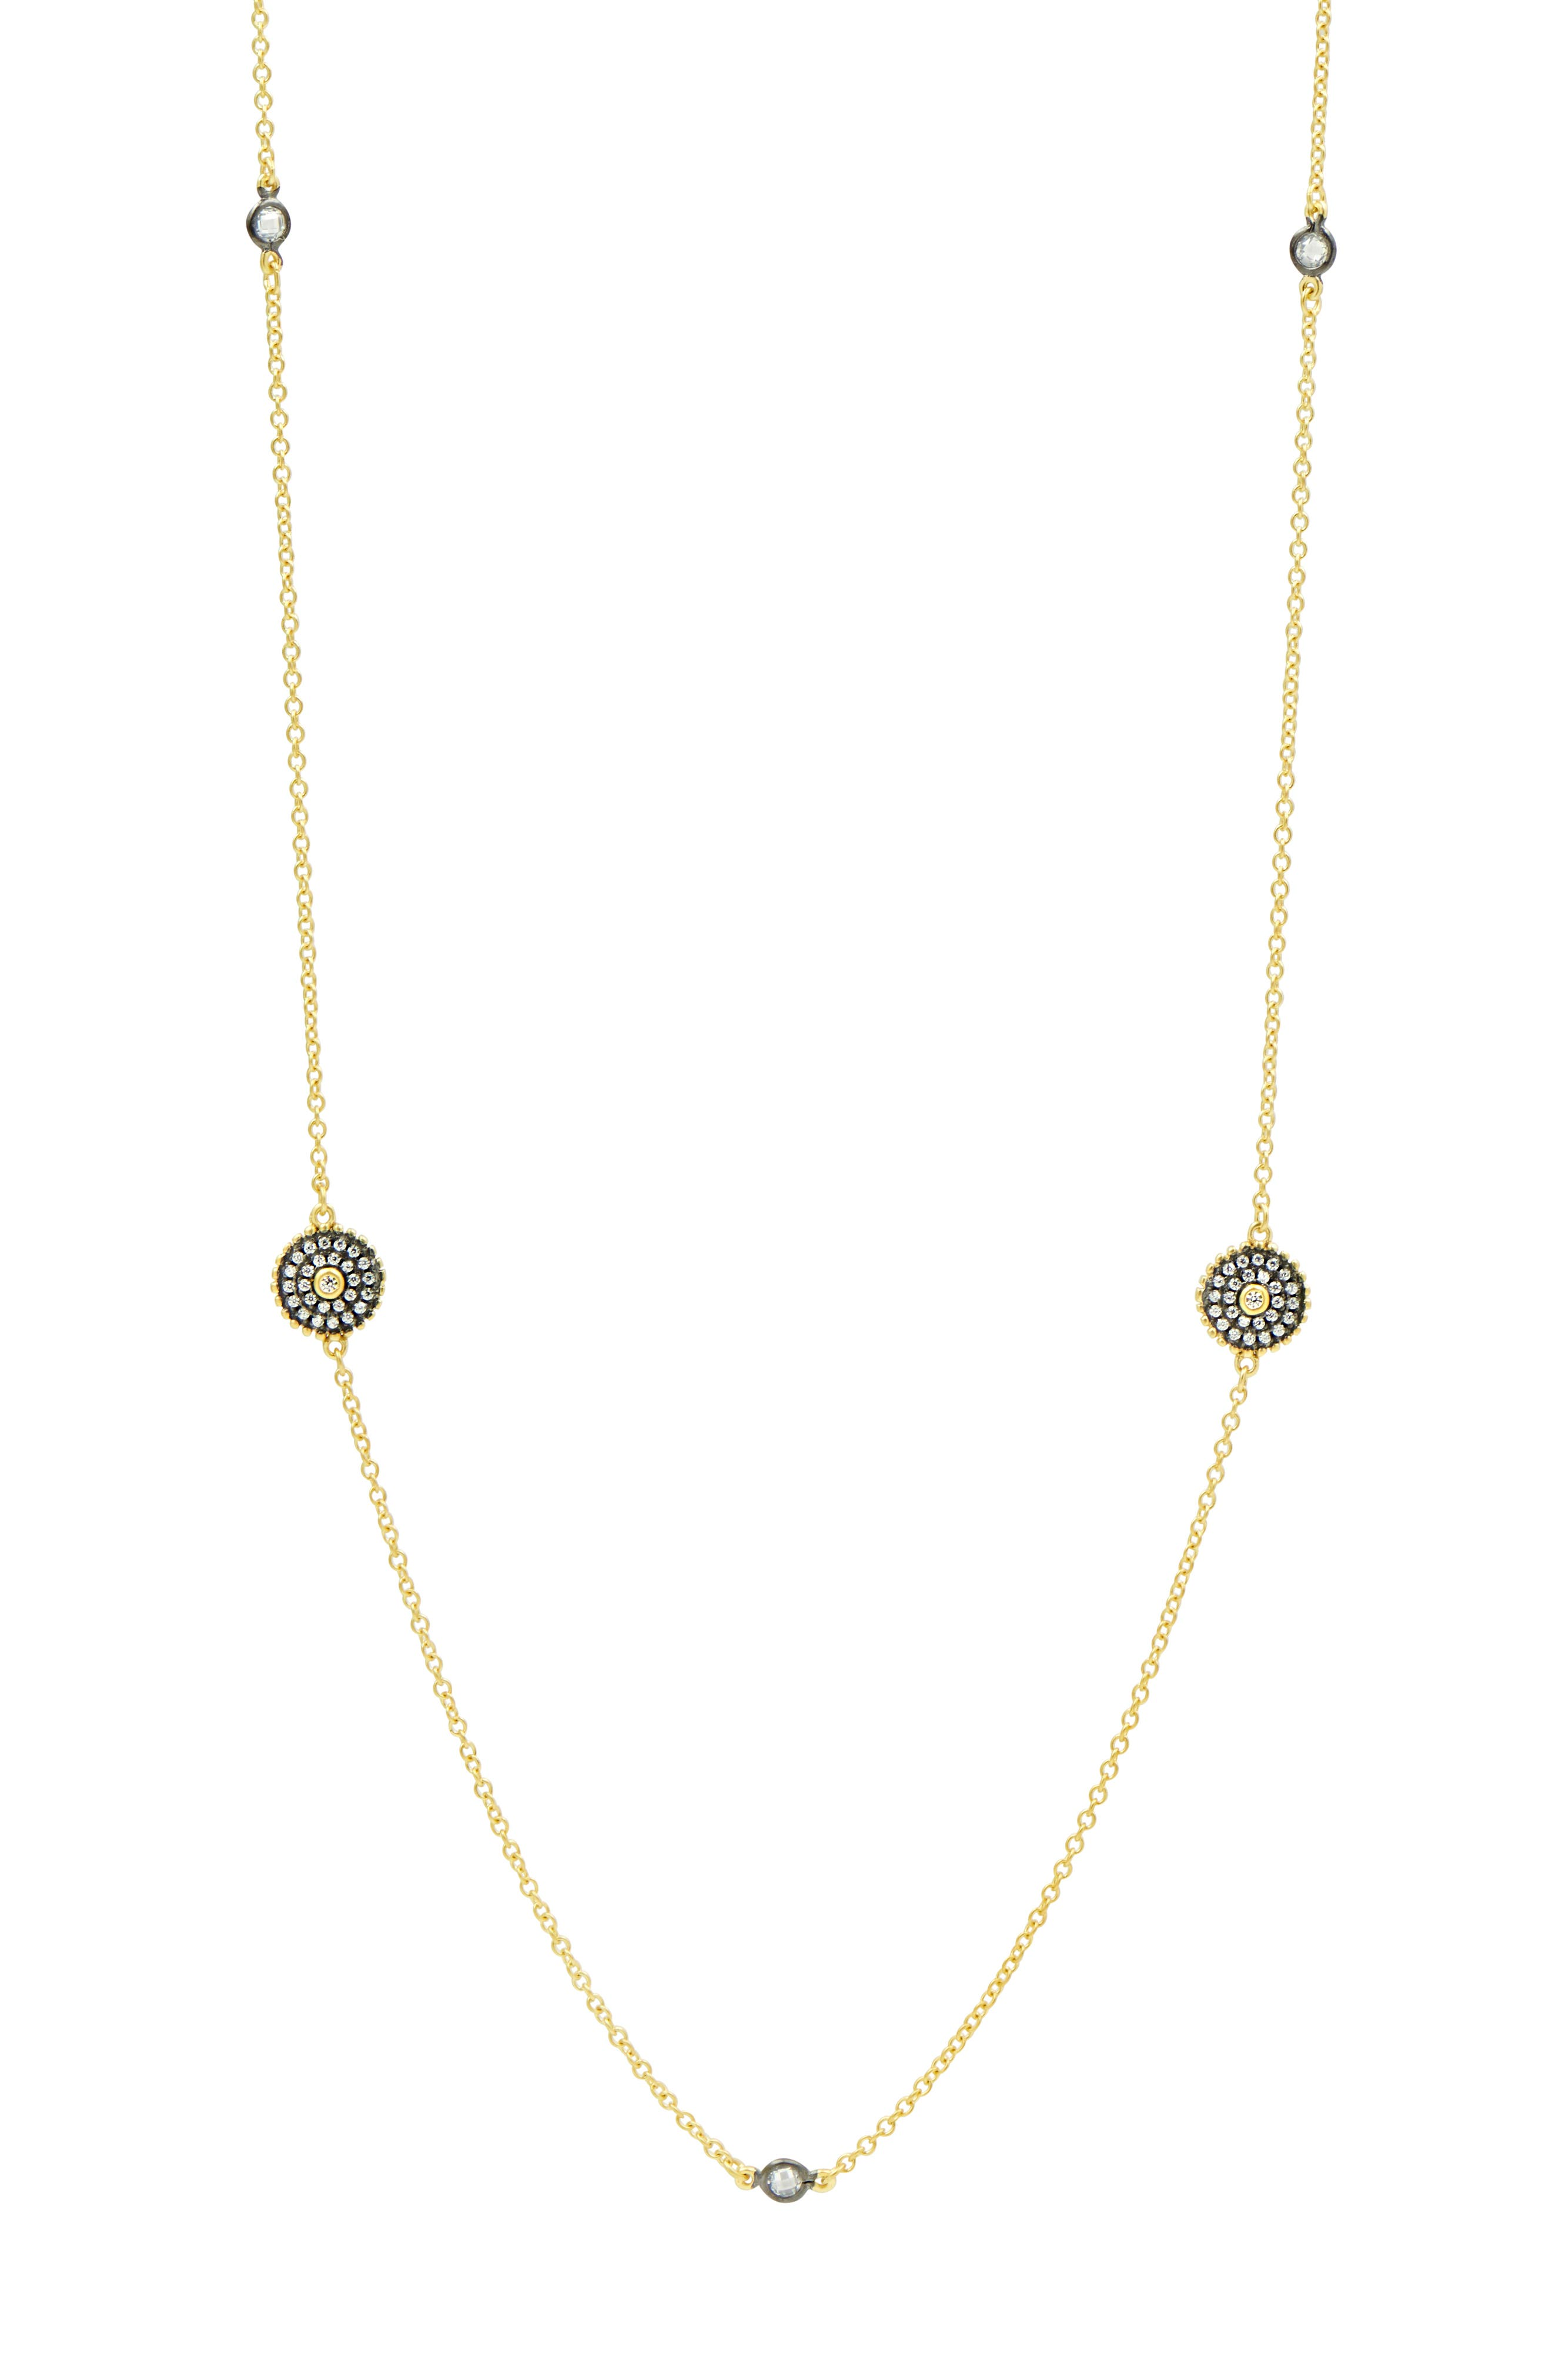 Double-Sided Pavé Disc Station Necklace,                             Alternate thumbnail 2, color,                             BLACK/ WHITE/ GOLD